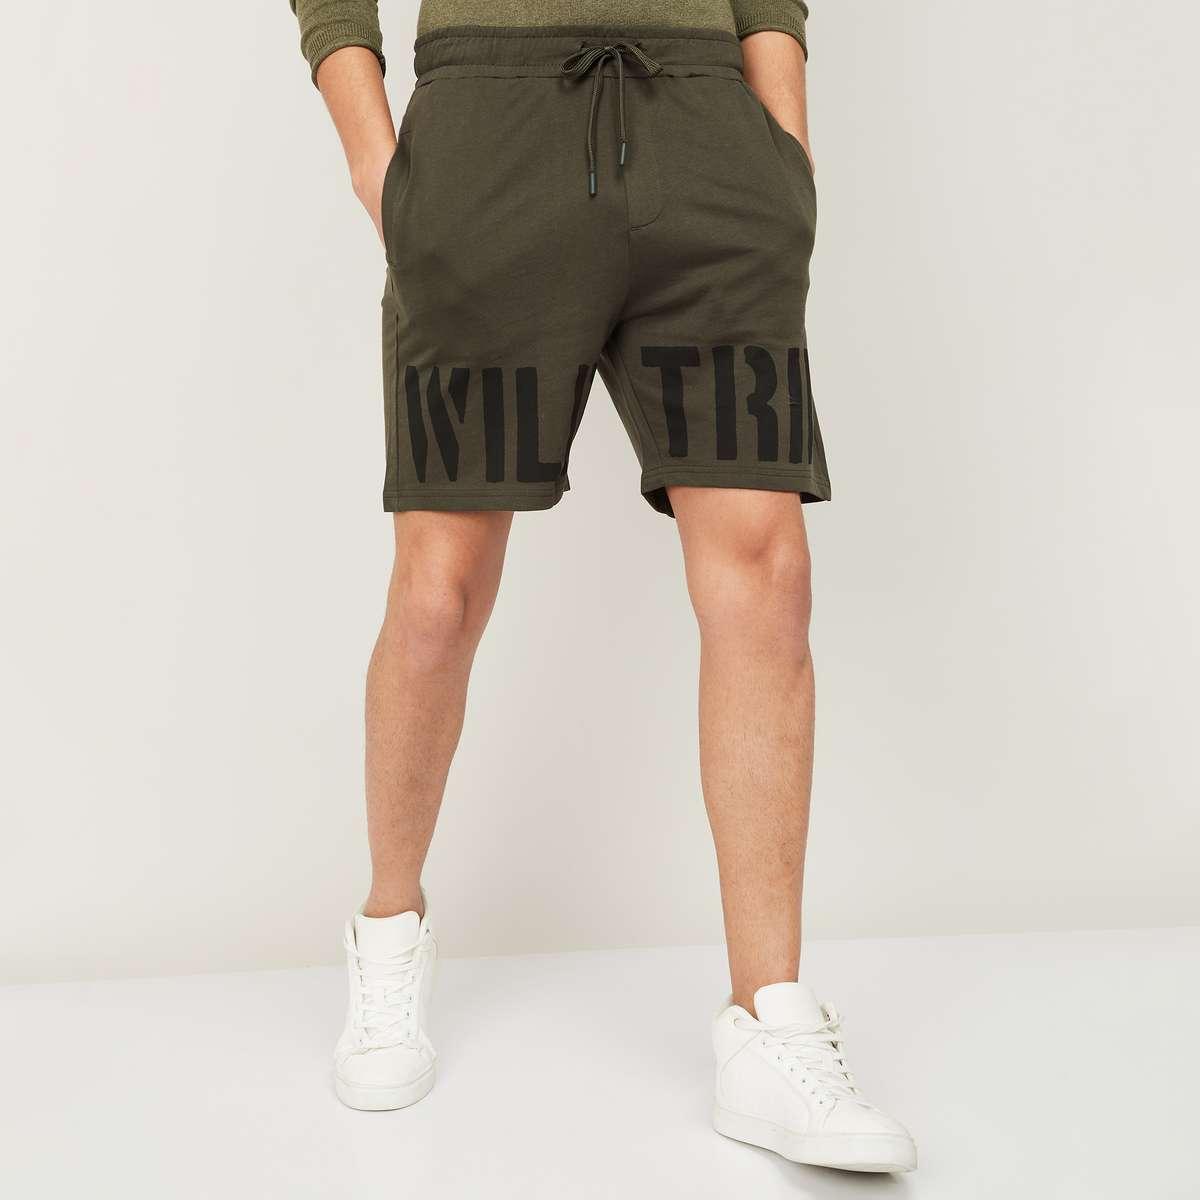 4.FORCA Men Printed Regular Fit Casual Shorts